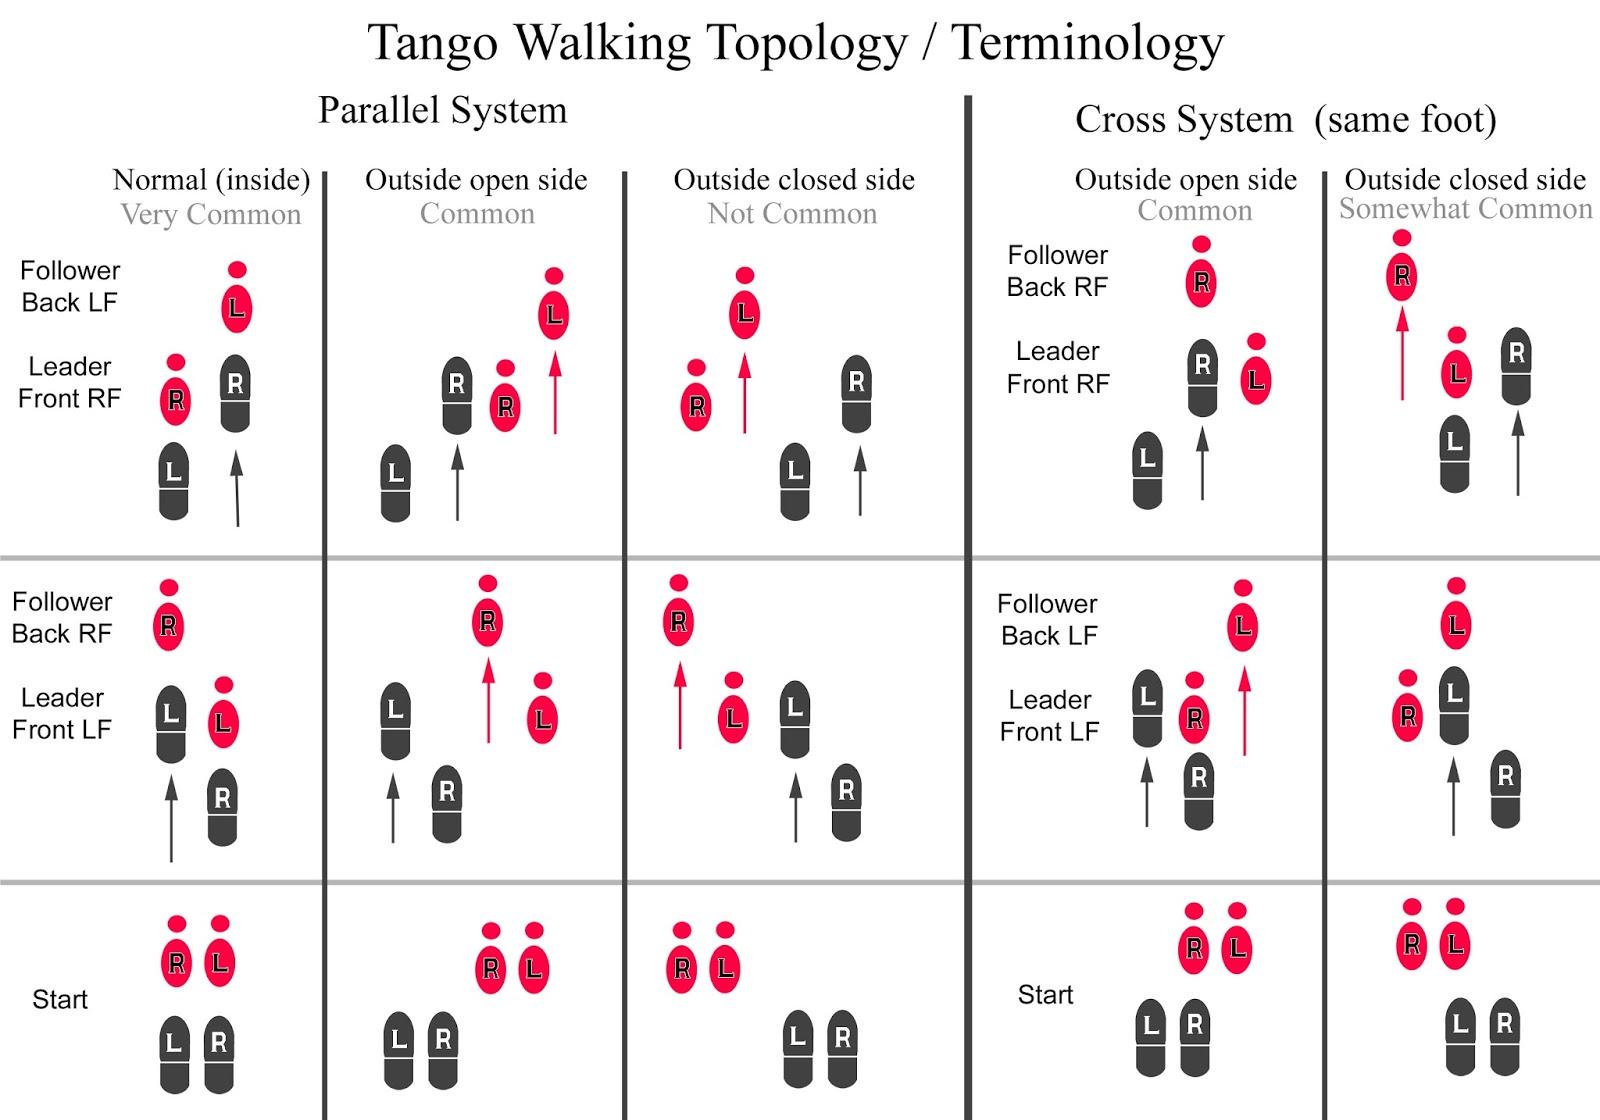 Tangowalking Print on The Basic Tango Dance Diagram